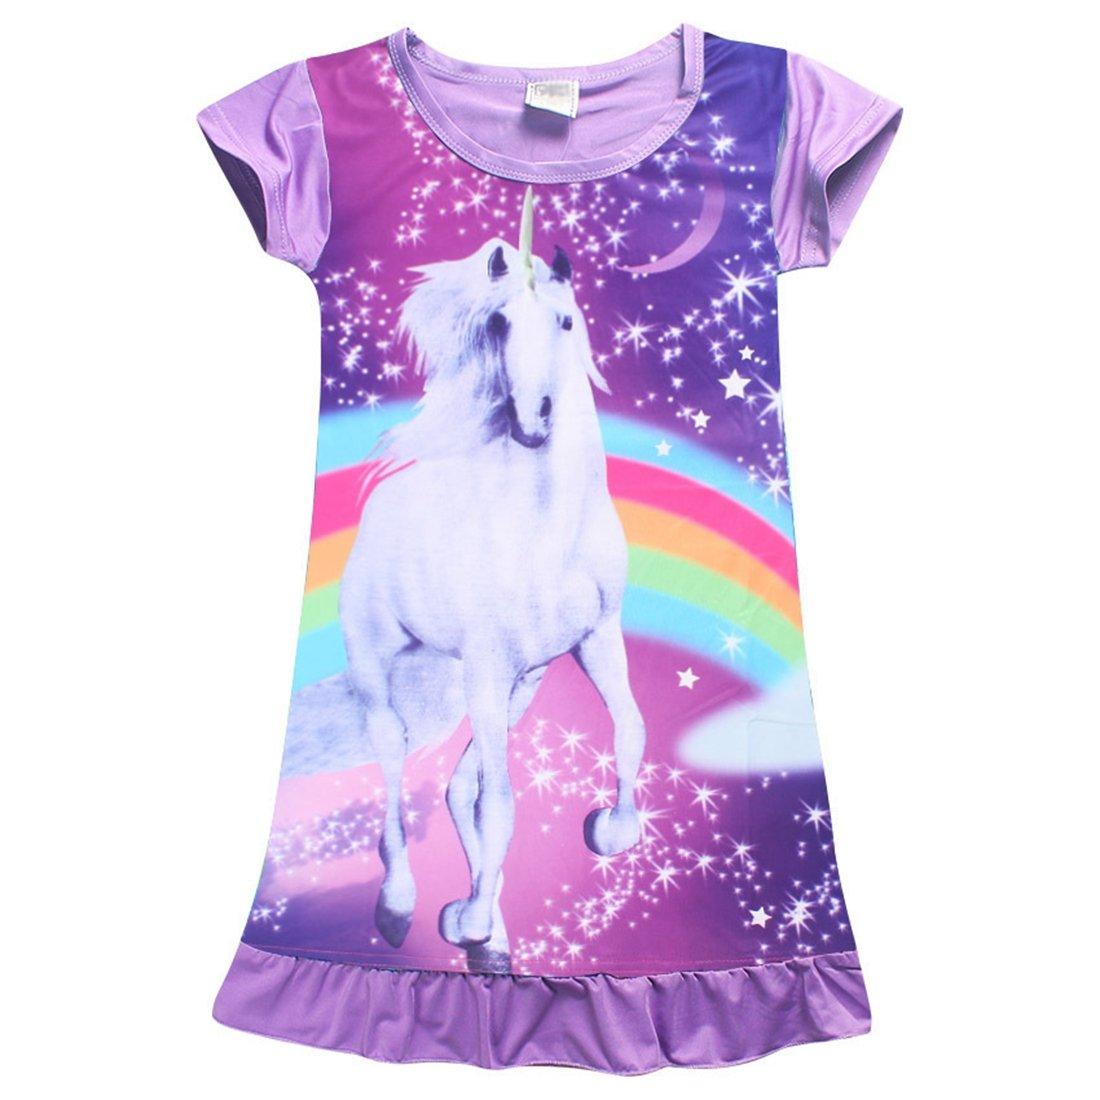 FEESHOW Girls Summer Short Sleeve Rainbow Cartoon Pajamas Night Dress Nighgown Sleepwear Costumes Purple 5-6